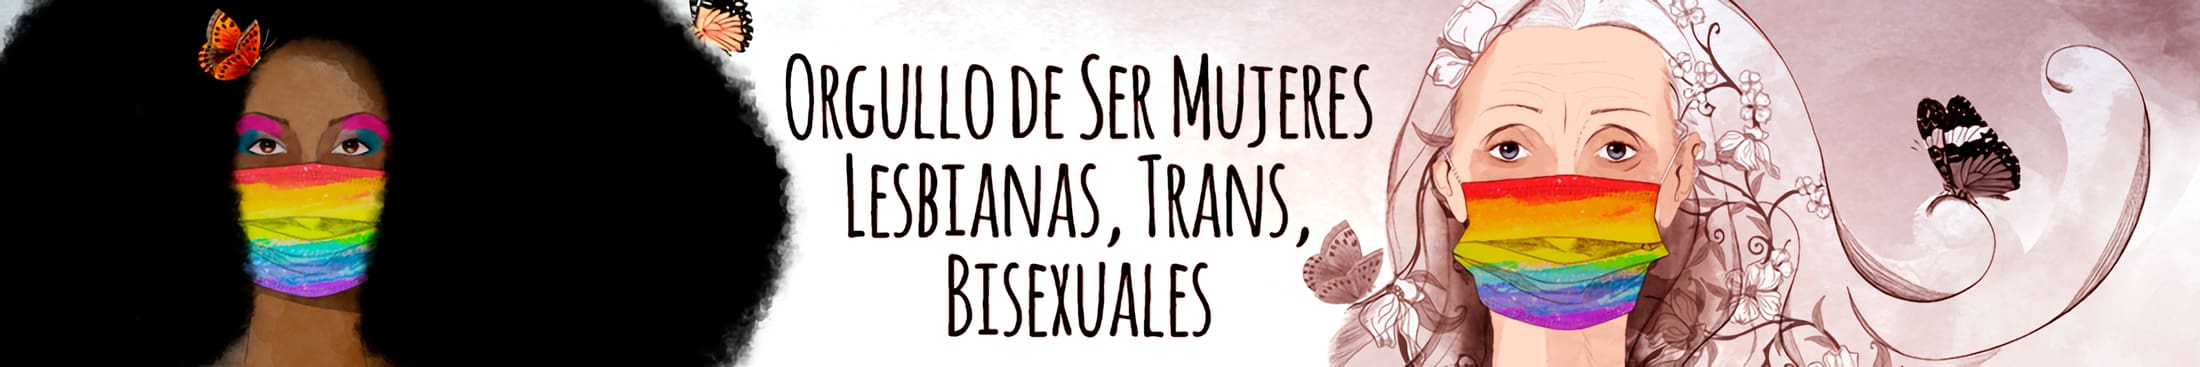 ORGULLO DE SER Mujeres Lesbianas, Trans, Bisexuales